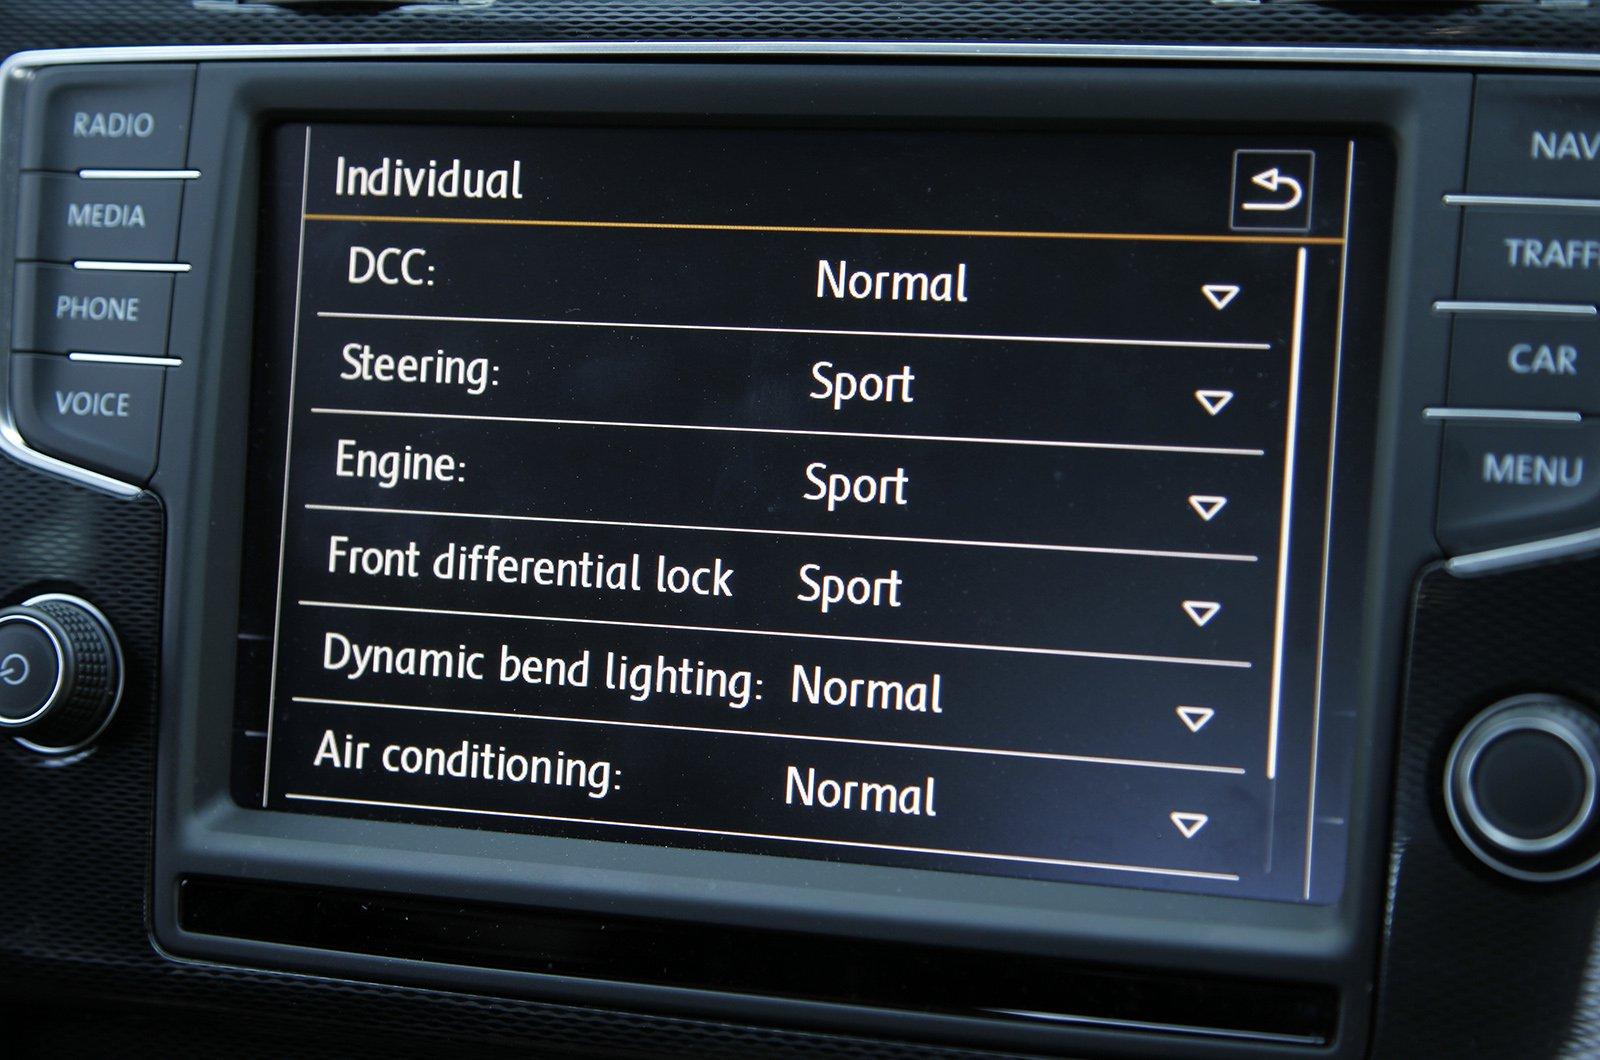 Volkswagen Golf GTI 2013-2019 infotainment screen